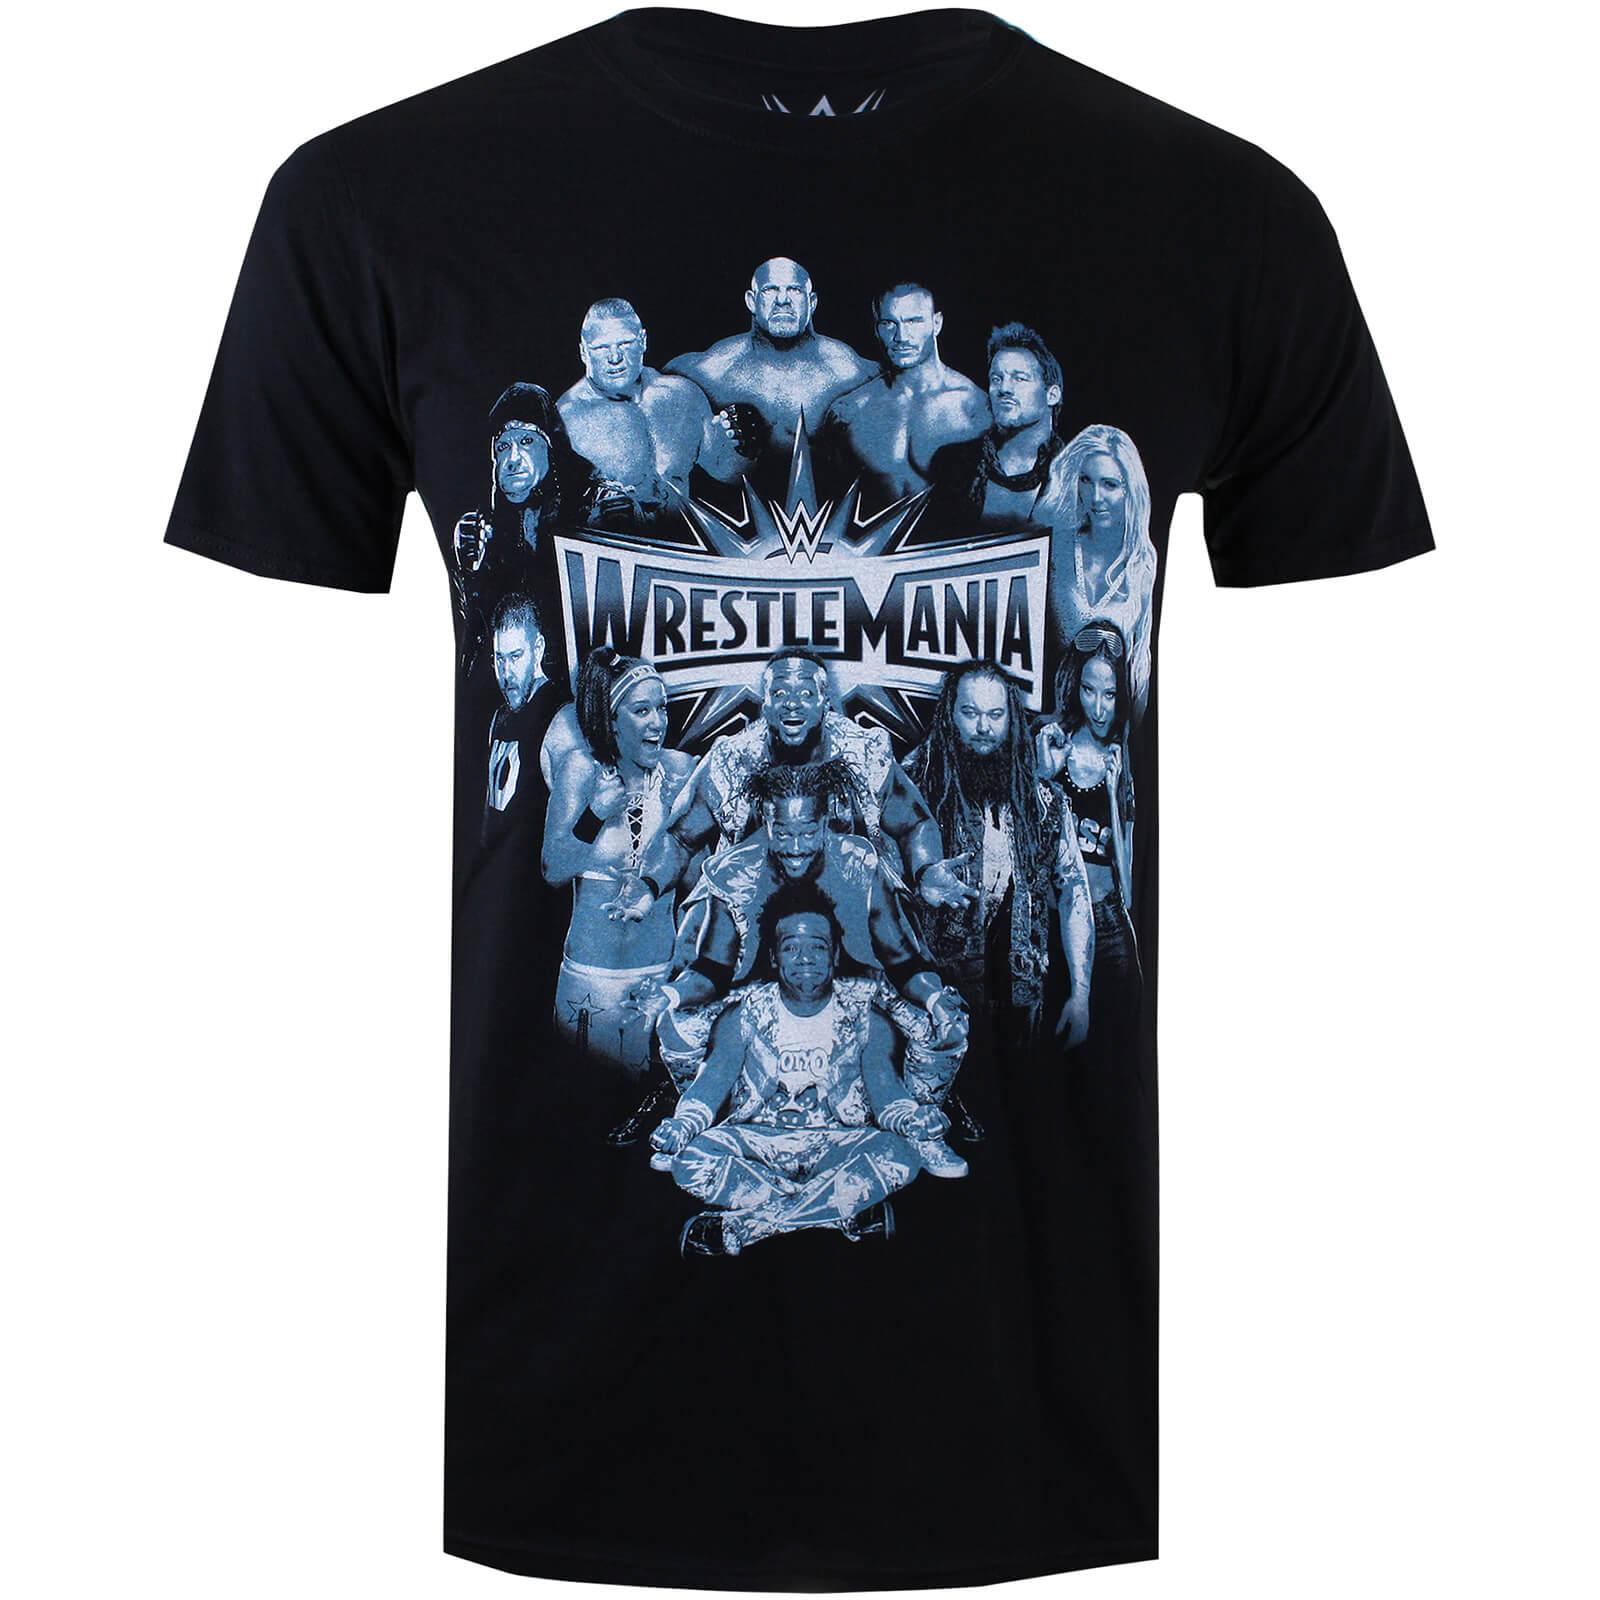 e6db8a693 Camiseta WWE Grupo Wrestlemania - Hombre - Negro Merchandise